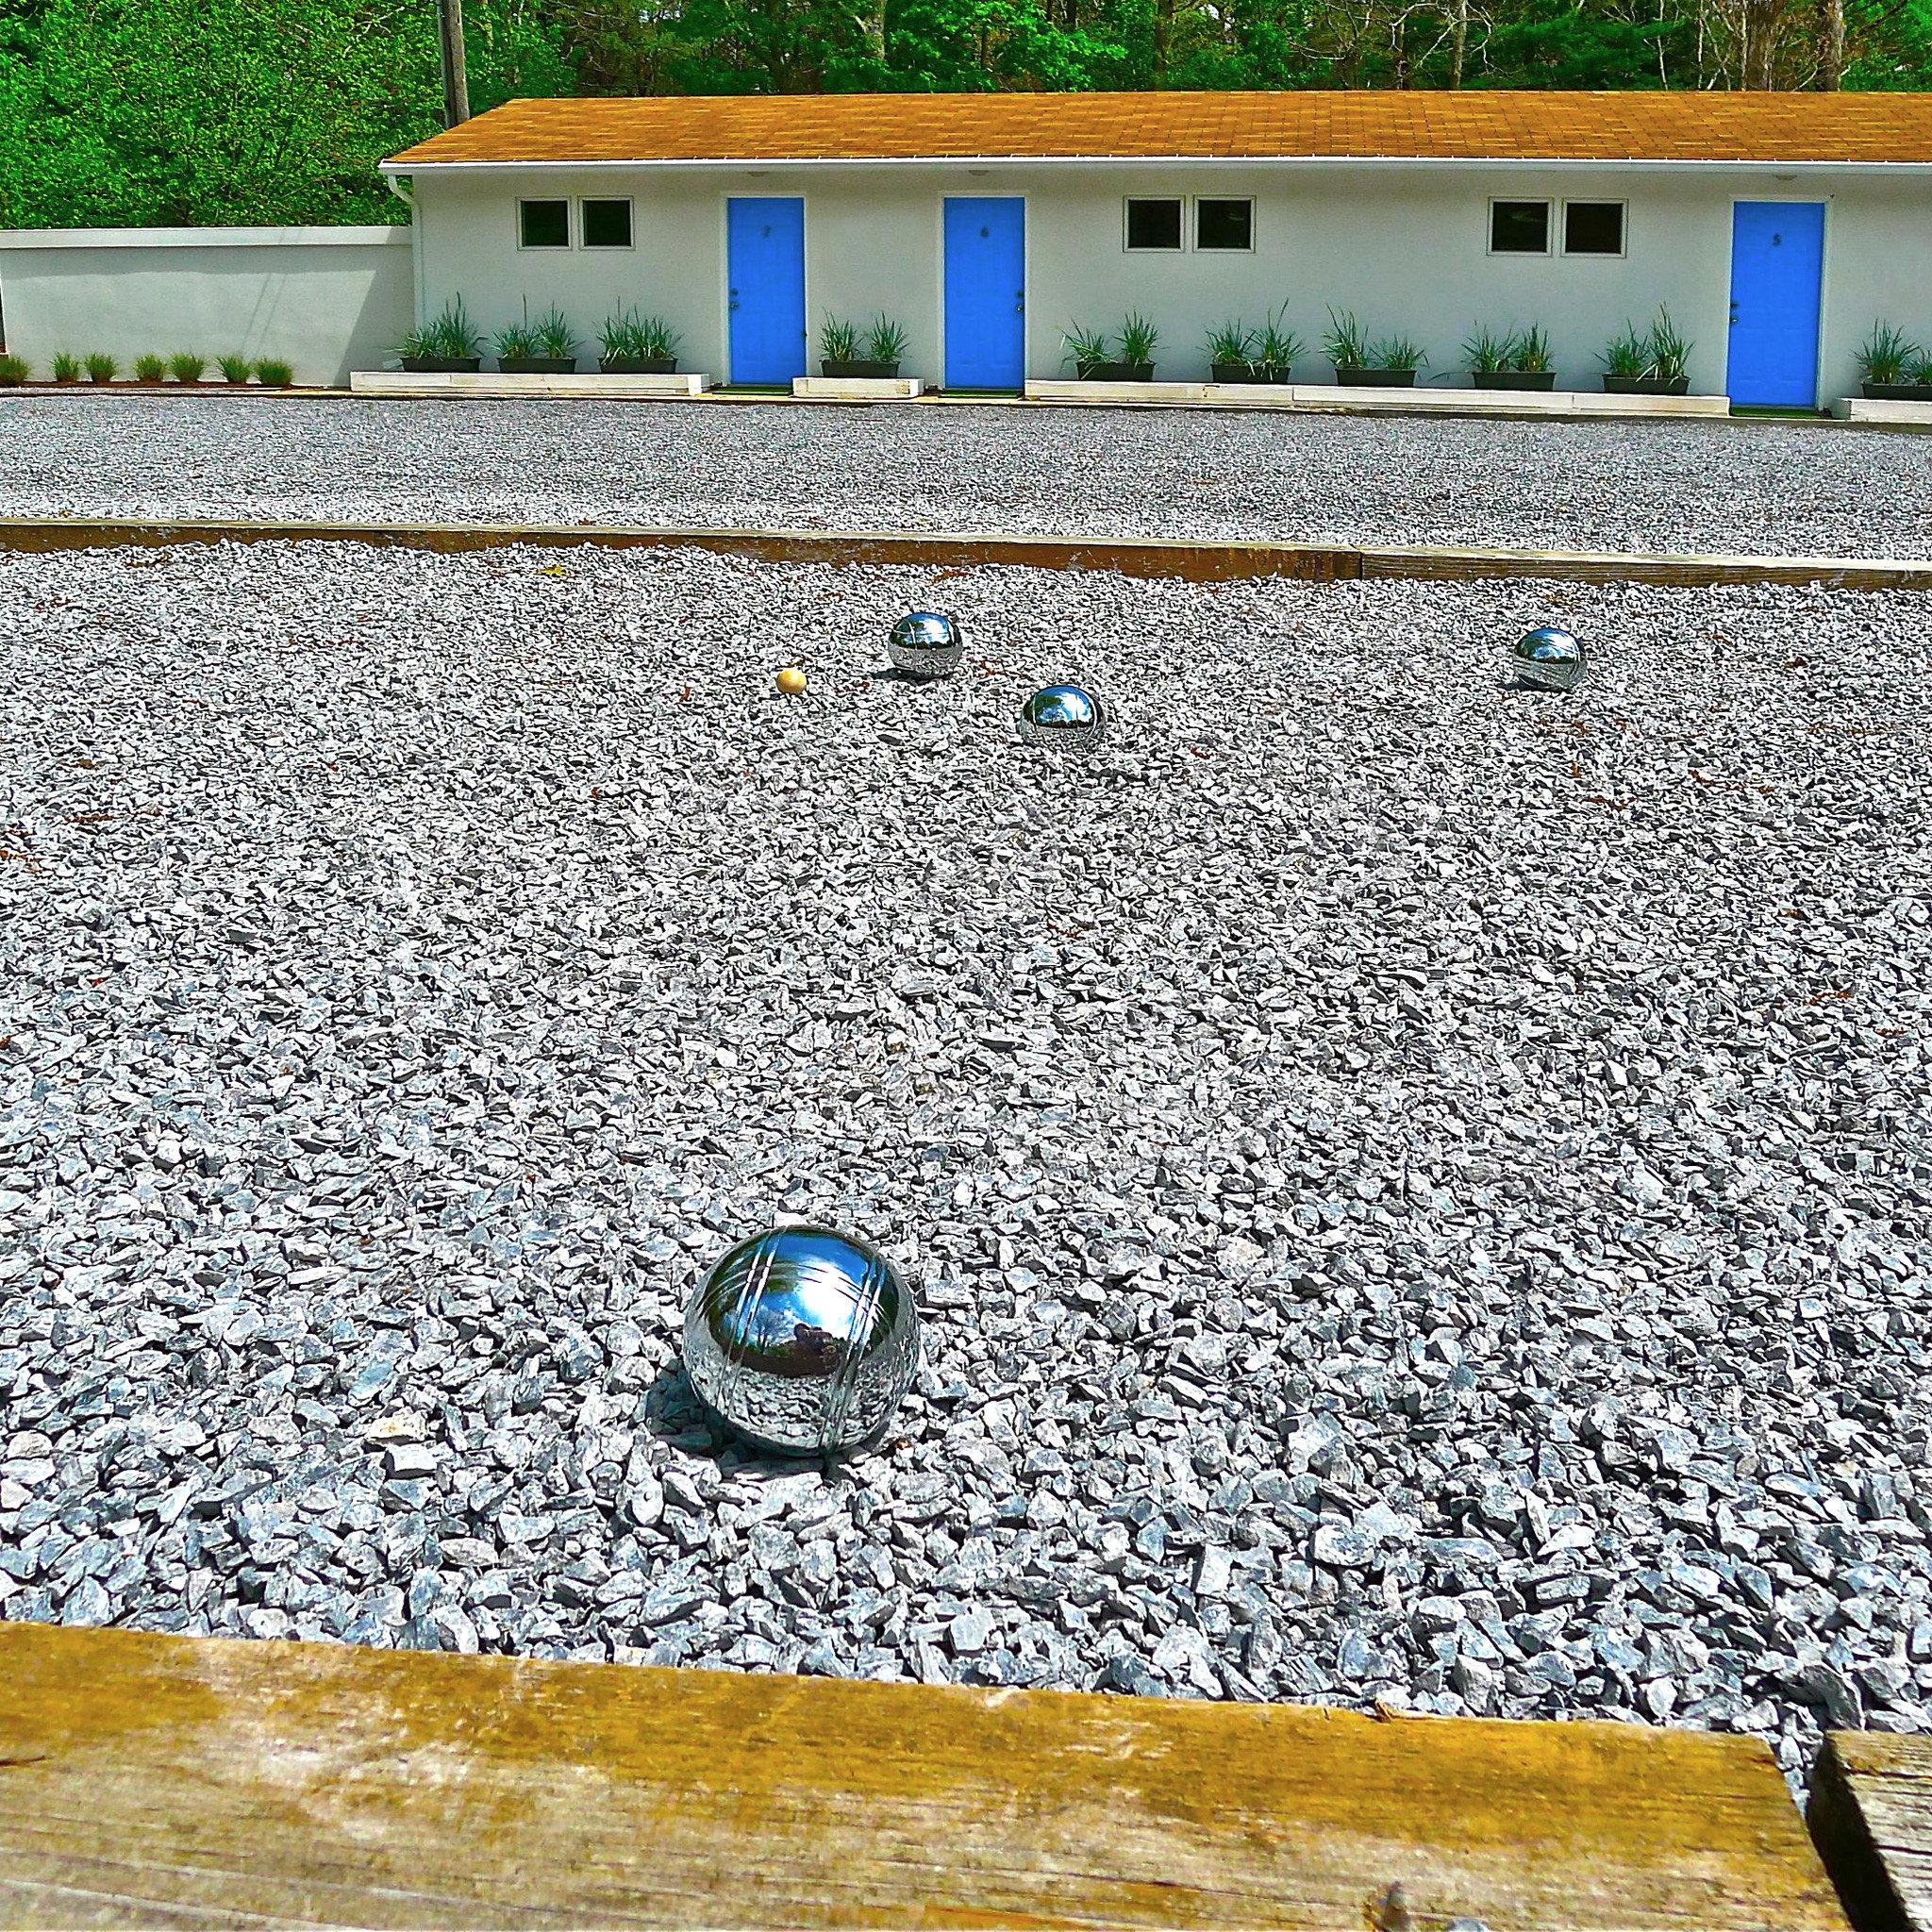 Boutique Budget Exterior Grounds Hip water road surface asphalt flooring cement